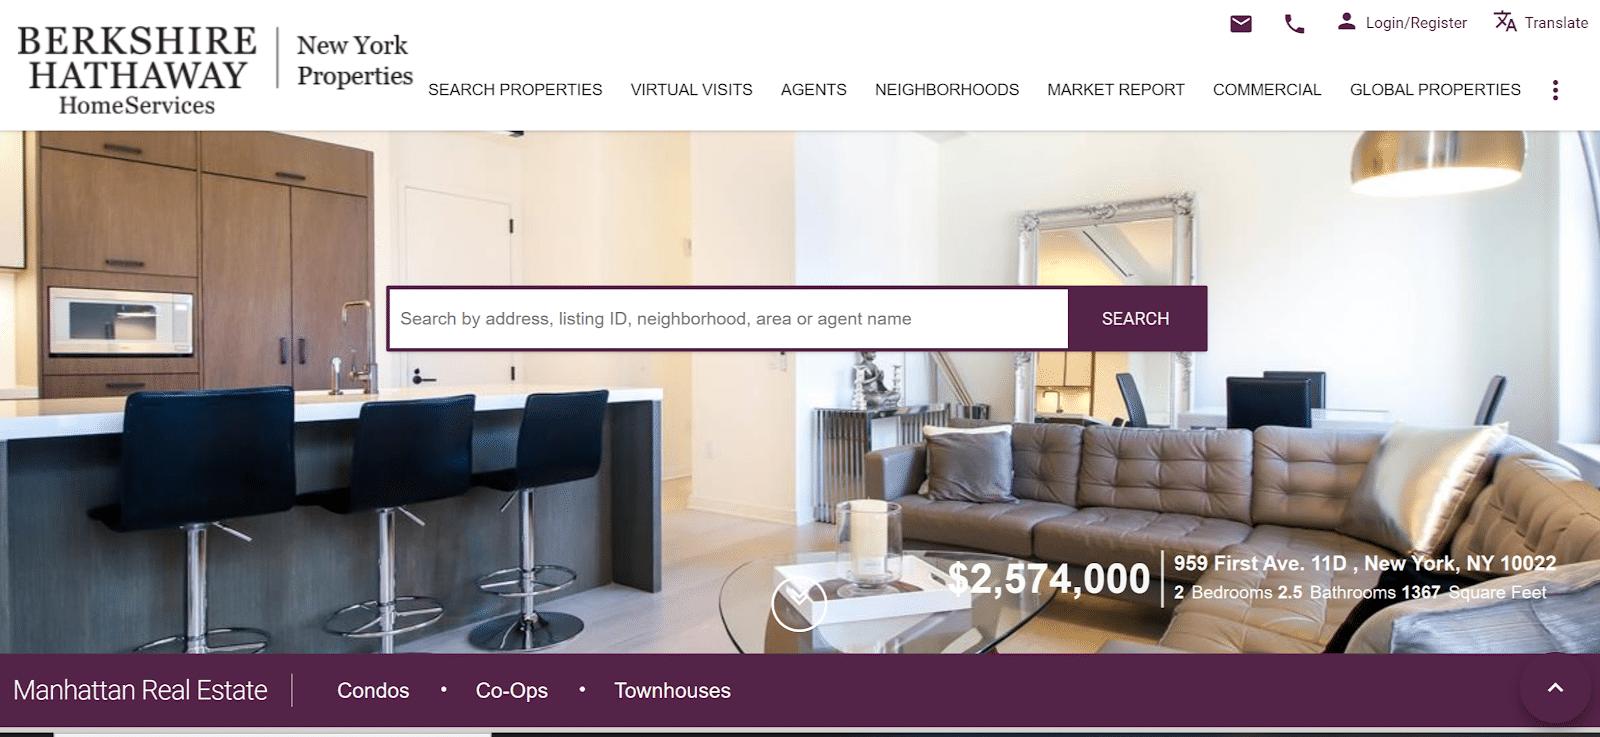 berkshire hathaway real estate landing page